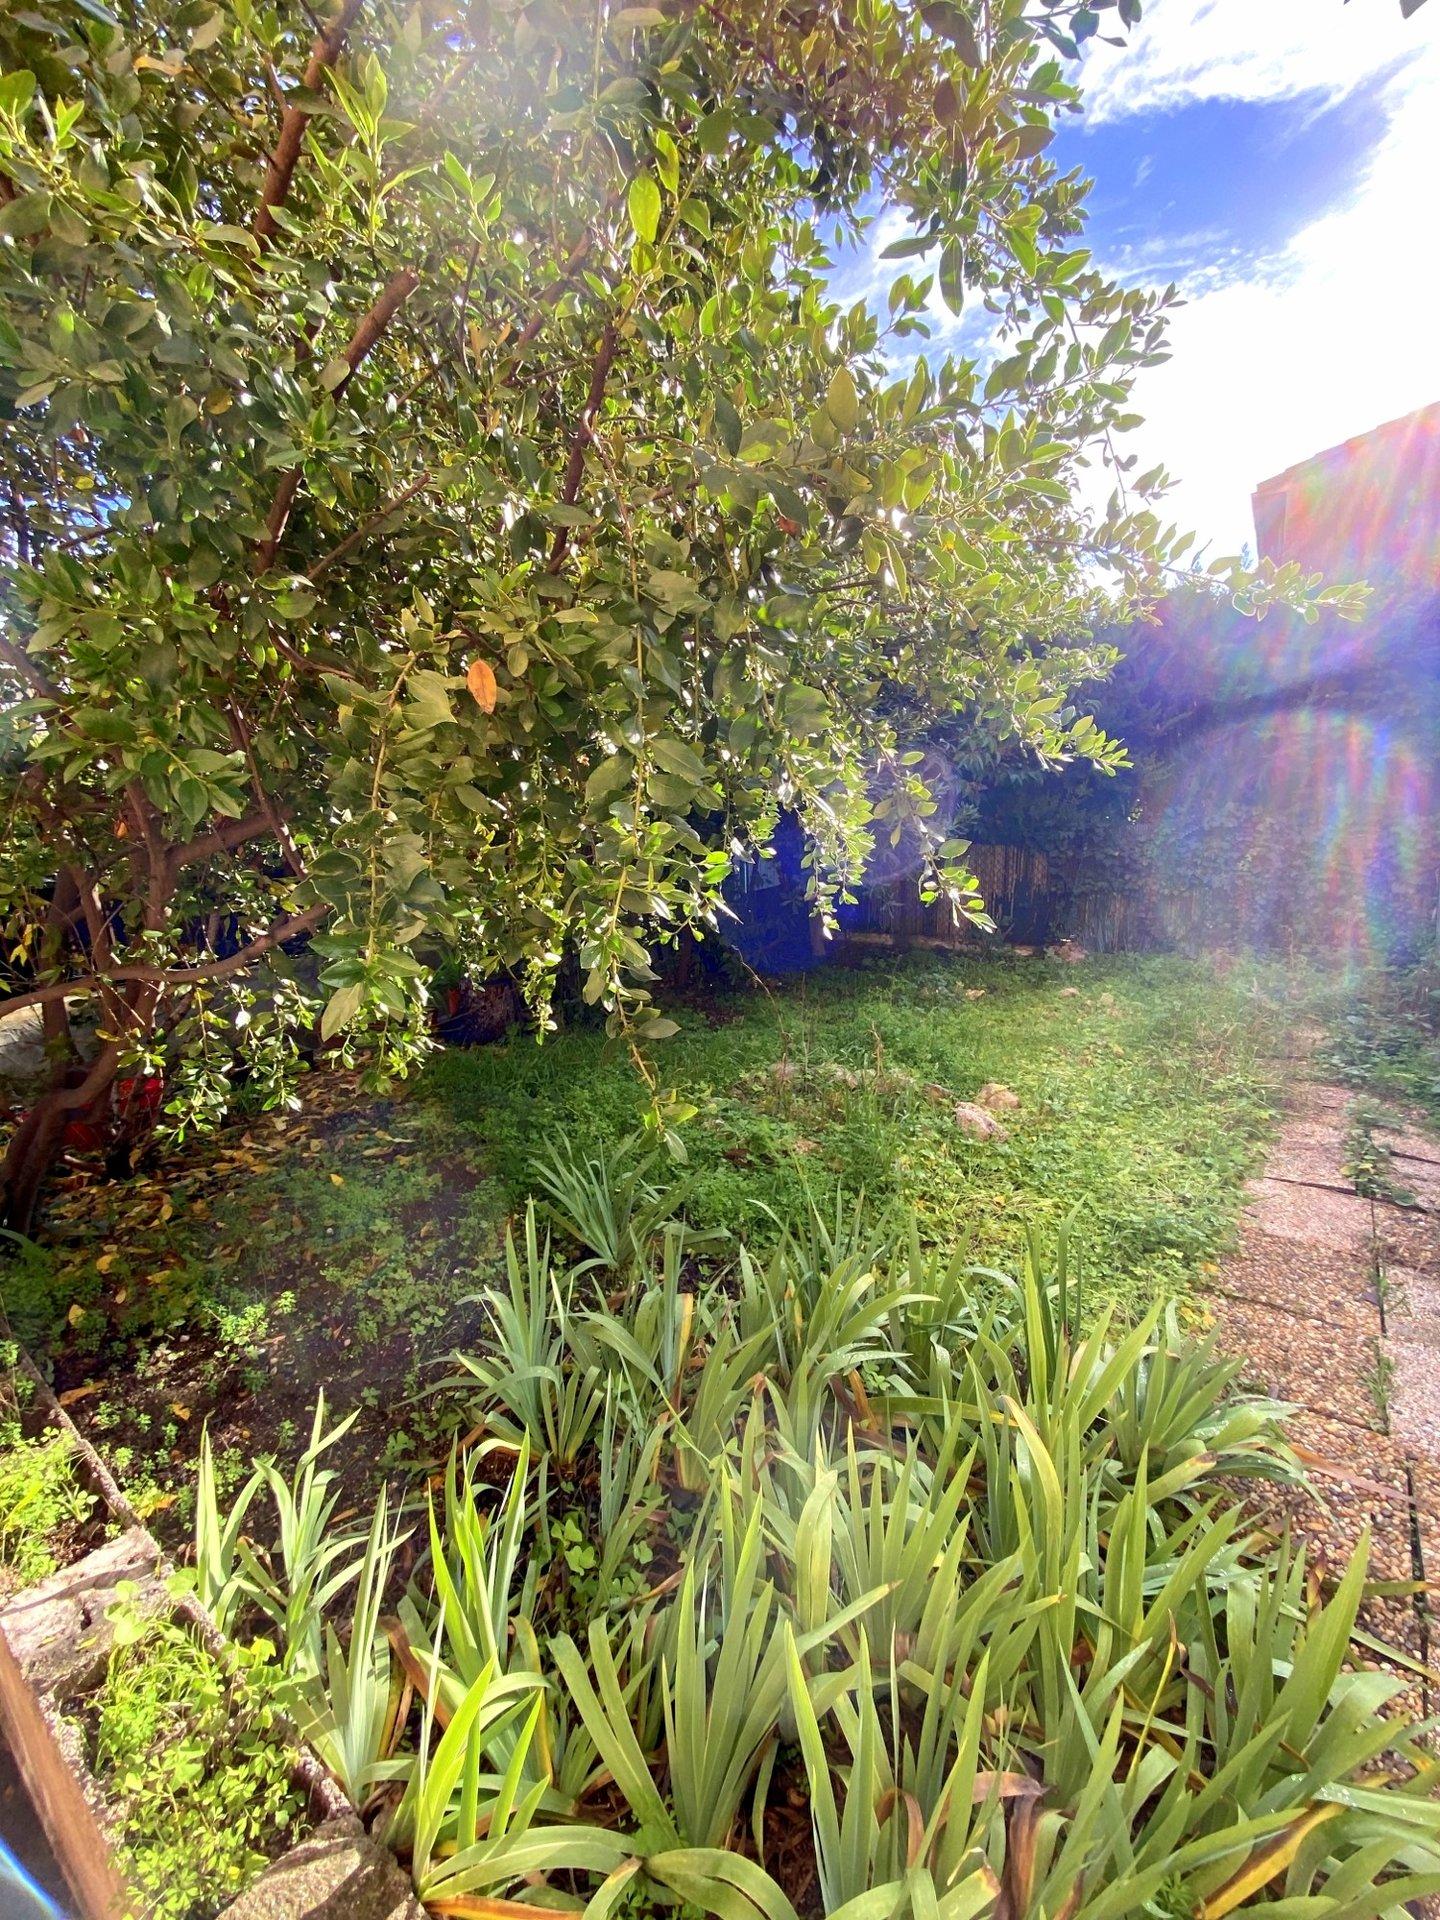 3 Pièces à vendre, jardin, Nice, Chambrun